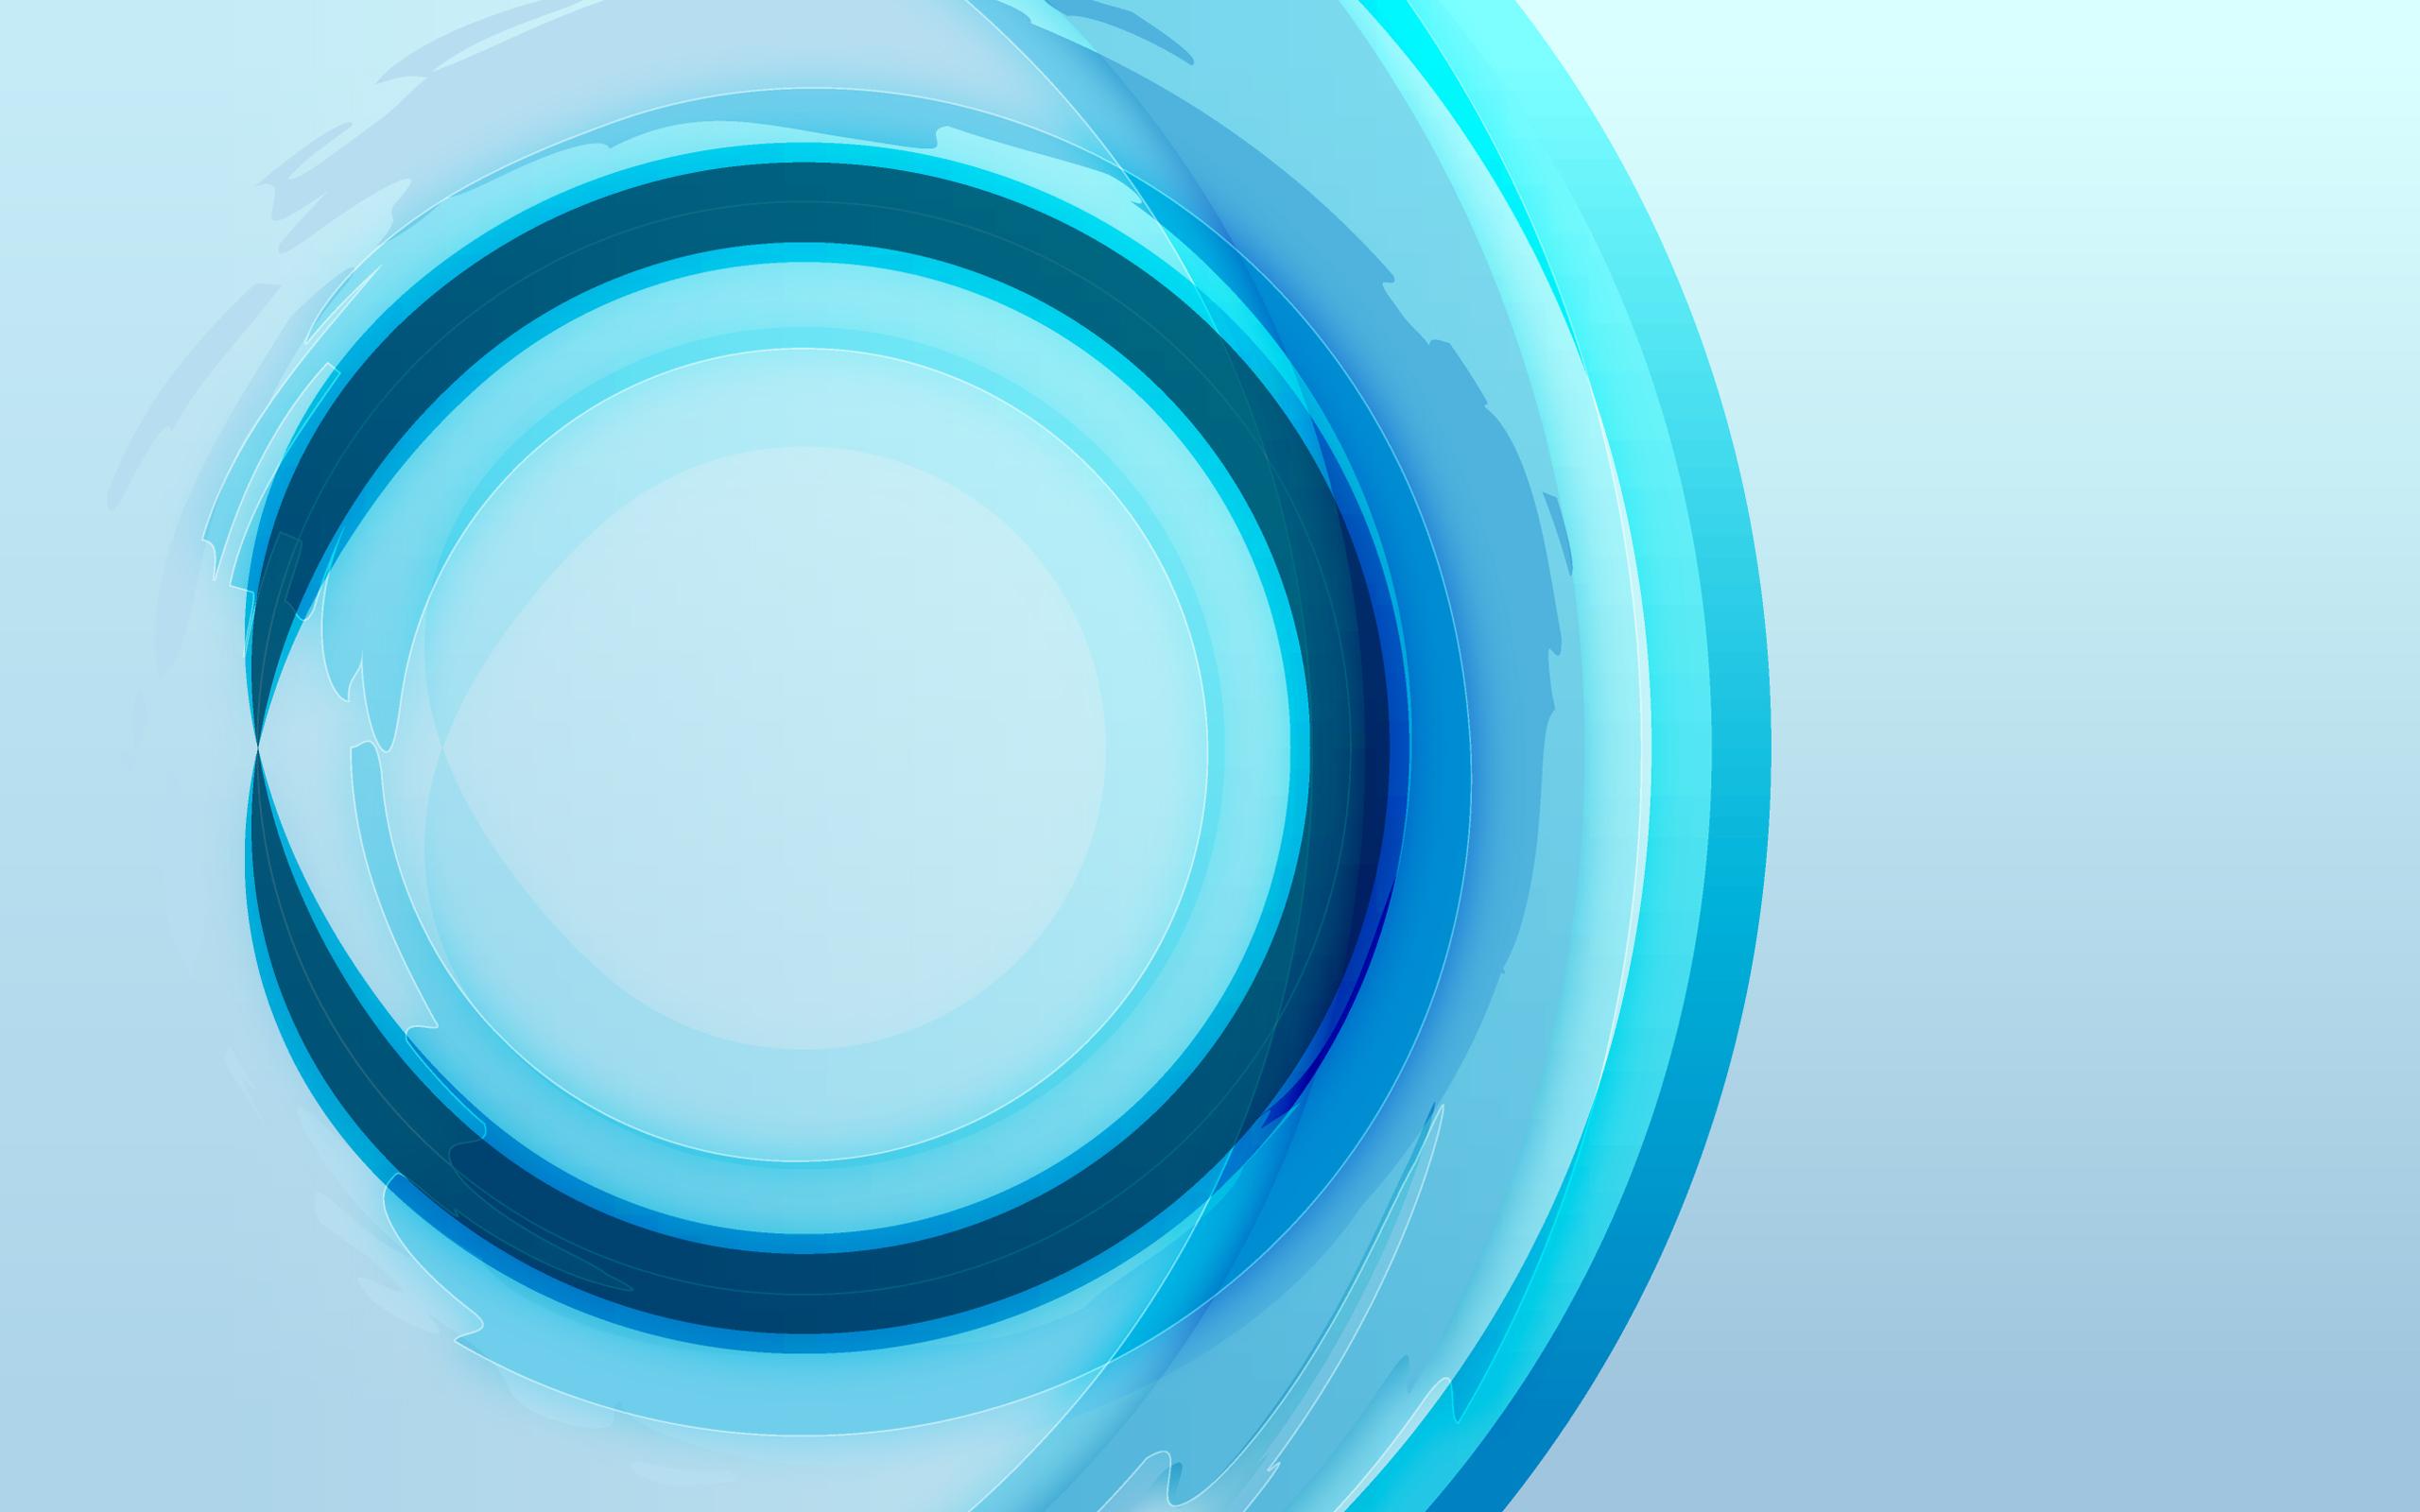 Wallpaper For Desktop Background 3d Picalls Com Blue Wash By Duckfarm